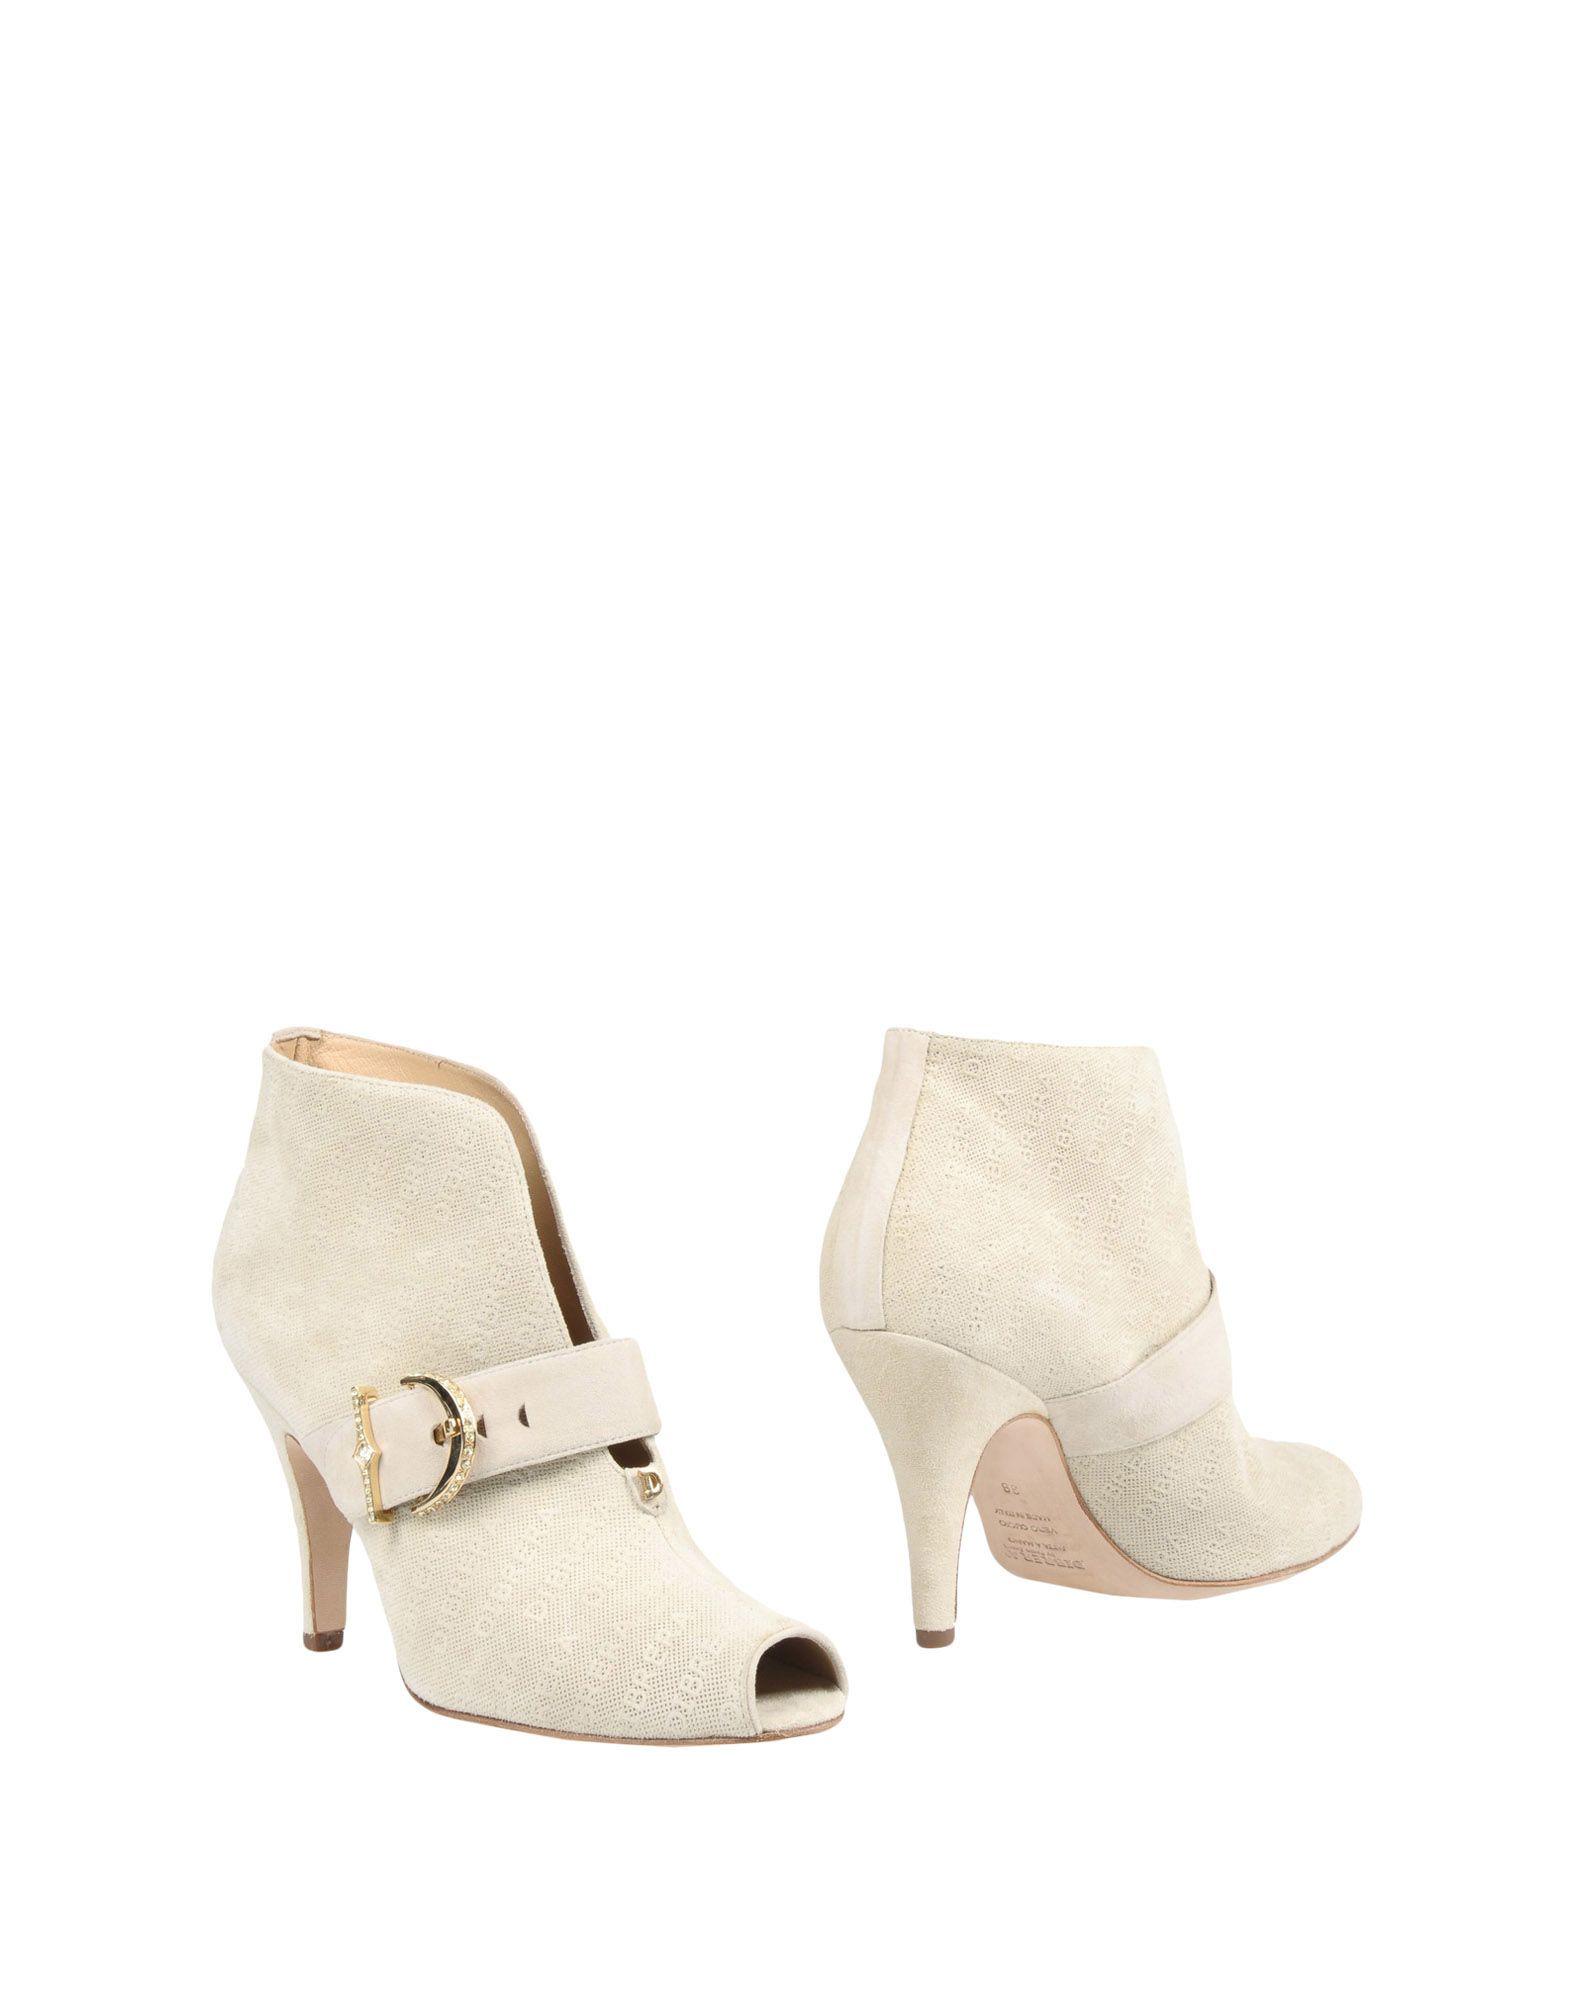 DIBRERA BY PAOLO ZANOLI Полусапоги и высокие ботинки полусапоги dibrera полусапоги